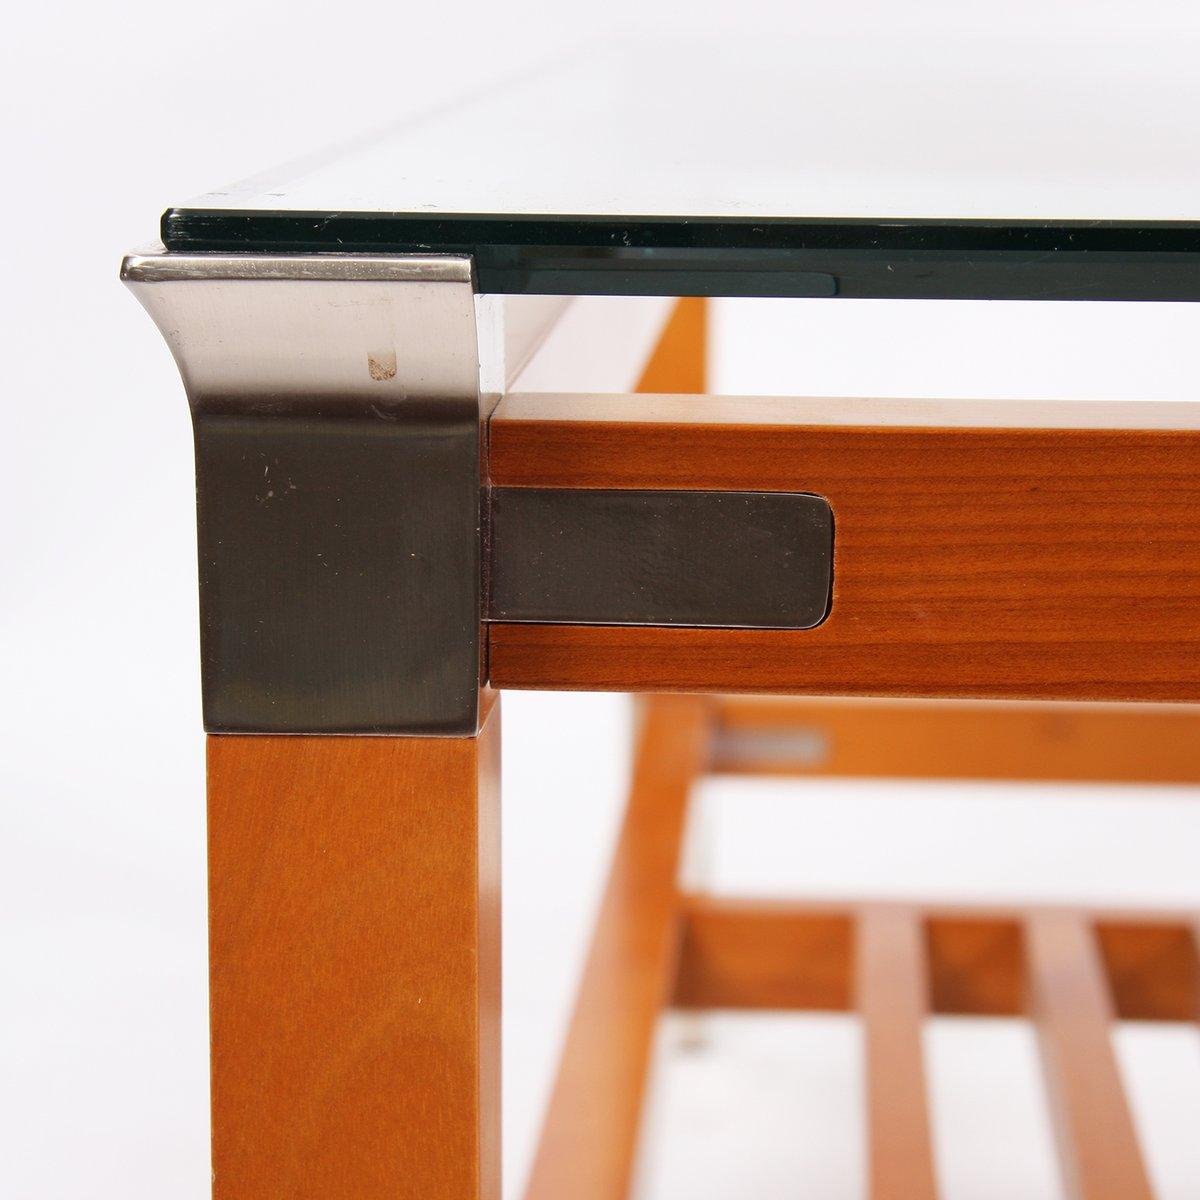 grande table basse carr e en bois et acier par pierre. Black Bedroom Furniture Sets. Home Design Ideas